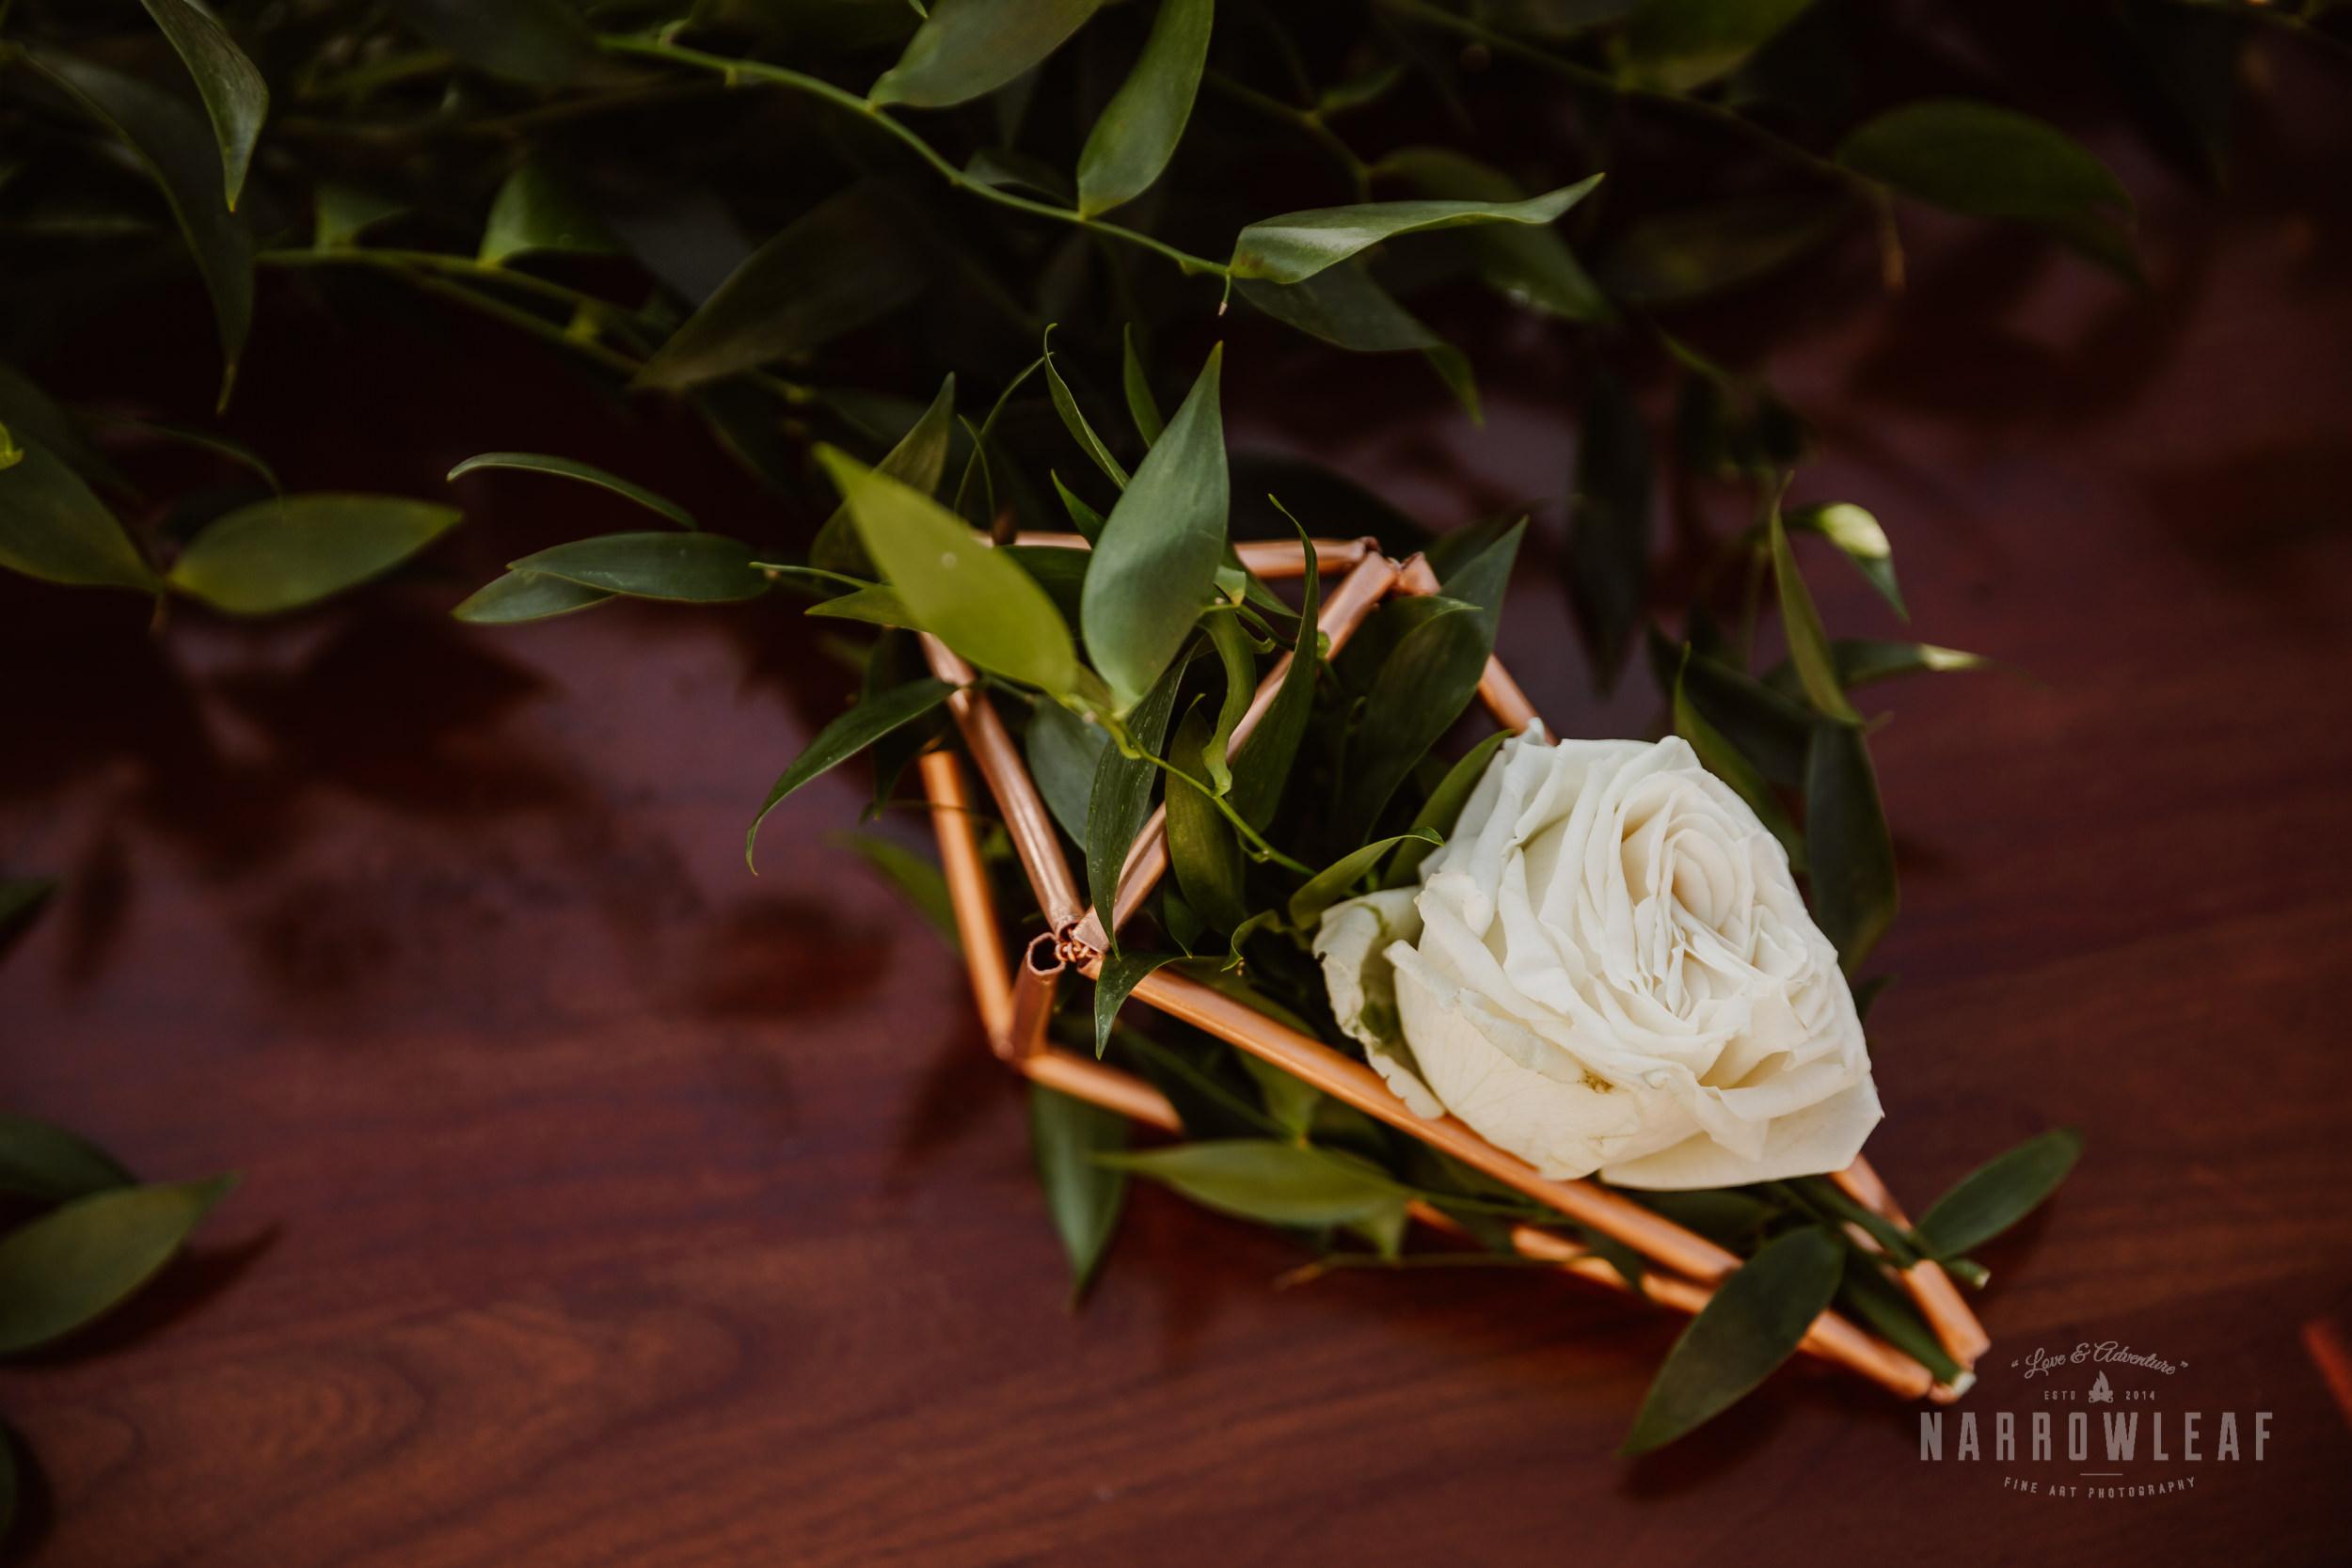 minnesota-adventure-elopement-Narrowleaf_Love_and_Adventure_Photography-9374.jpg